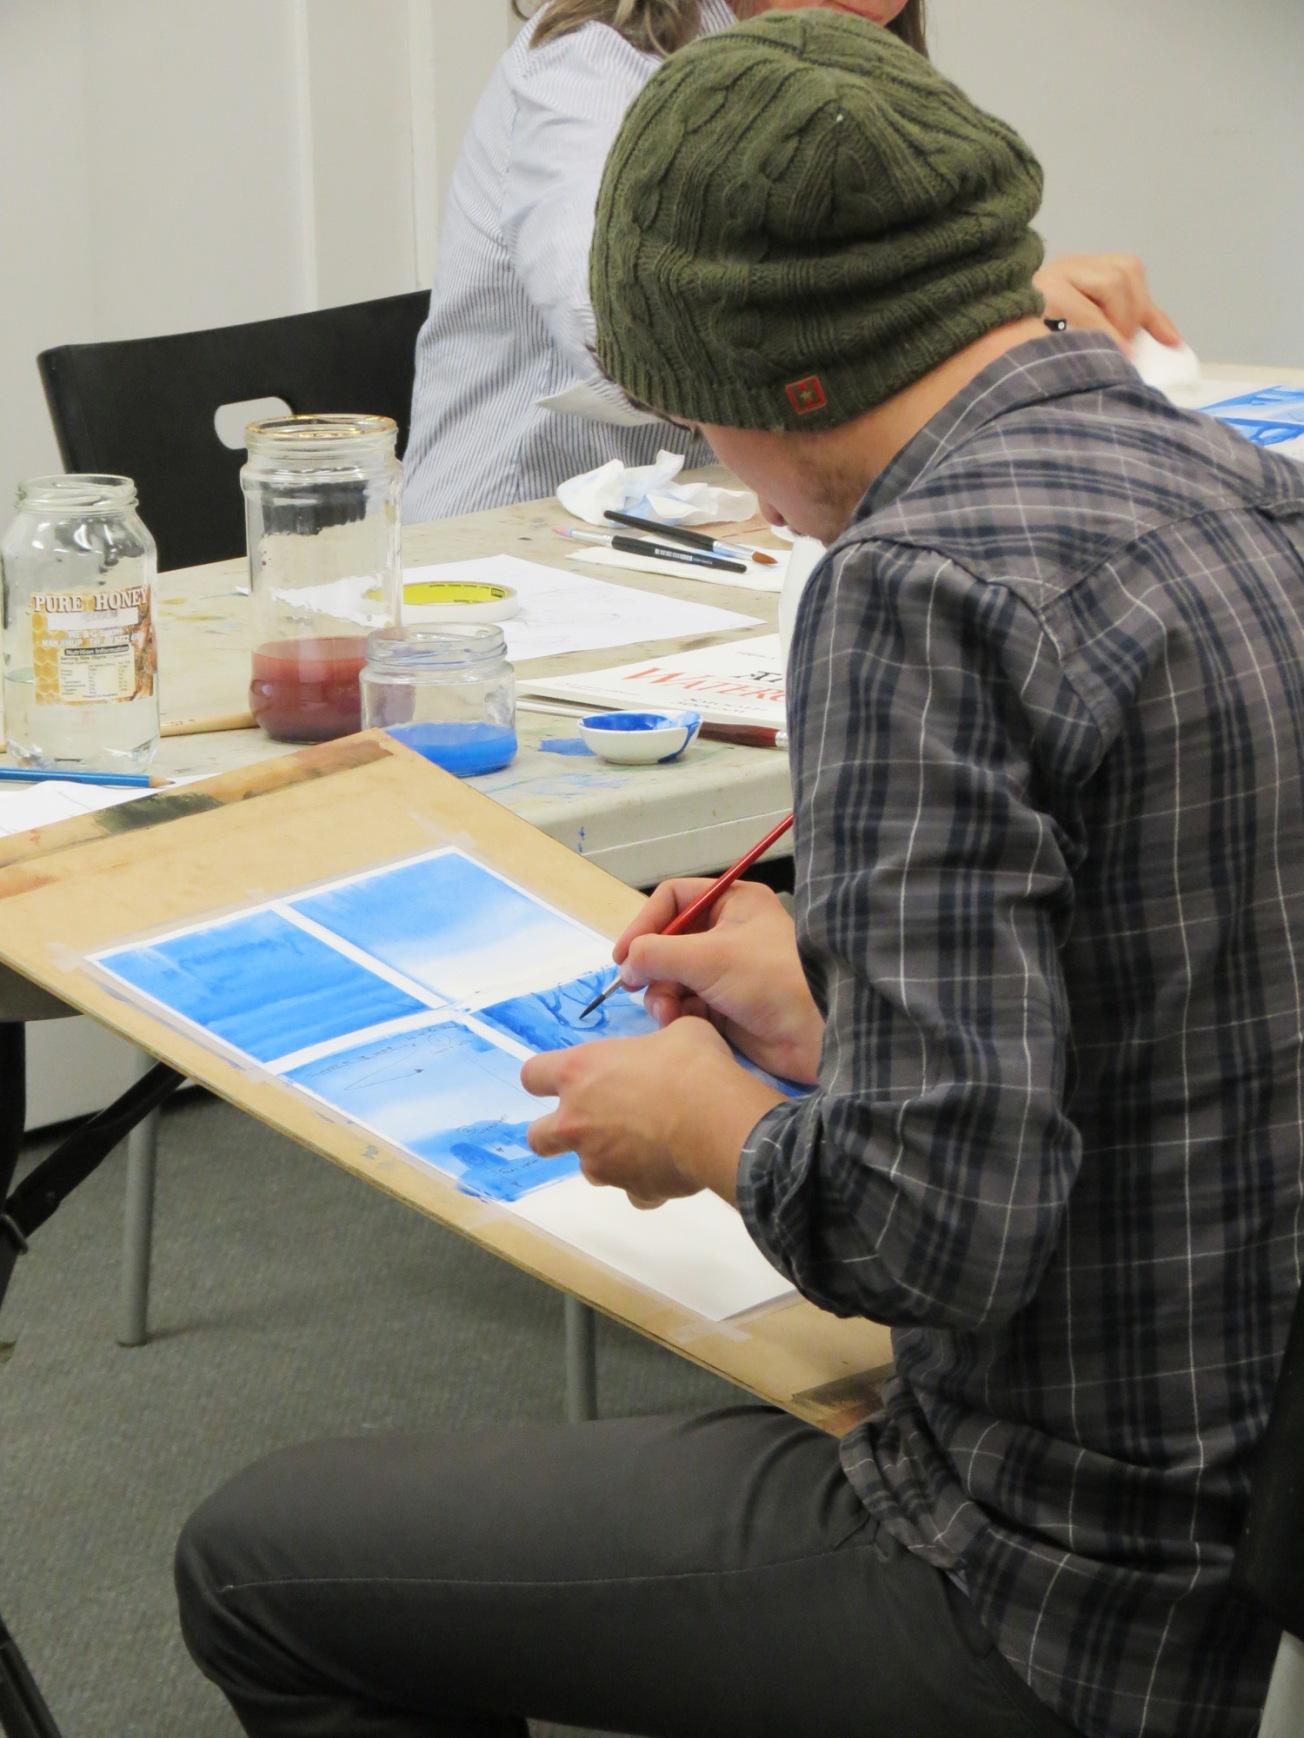 Workshop in Action